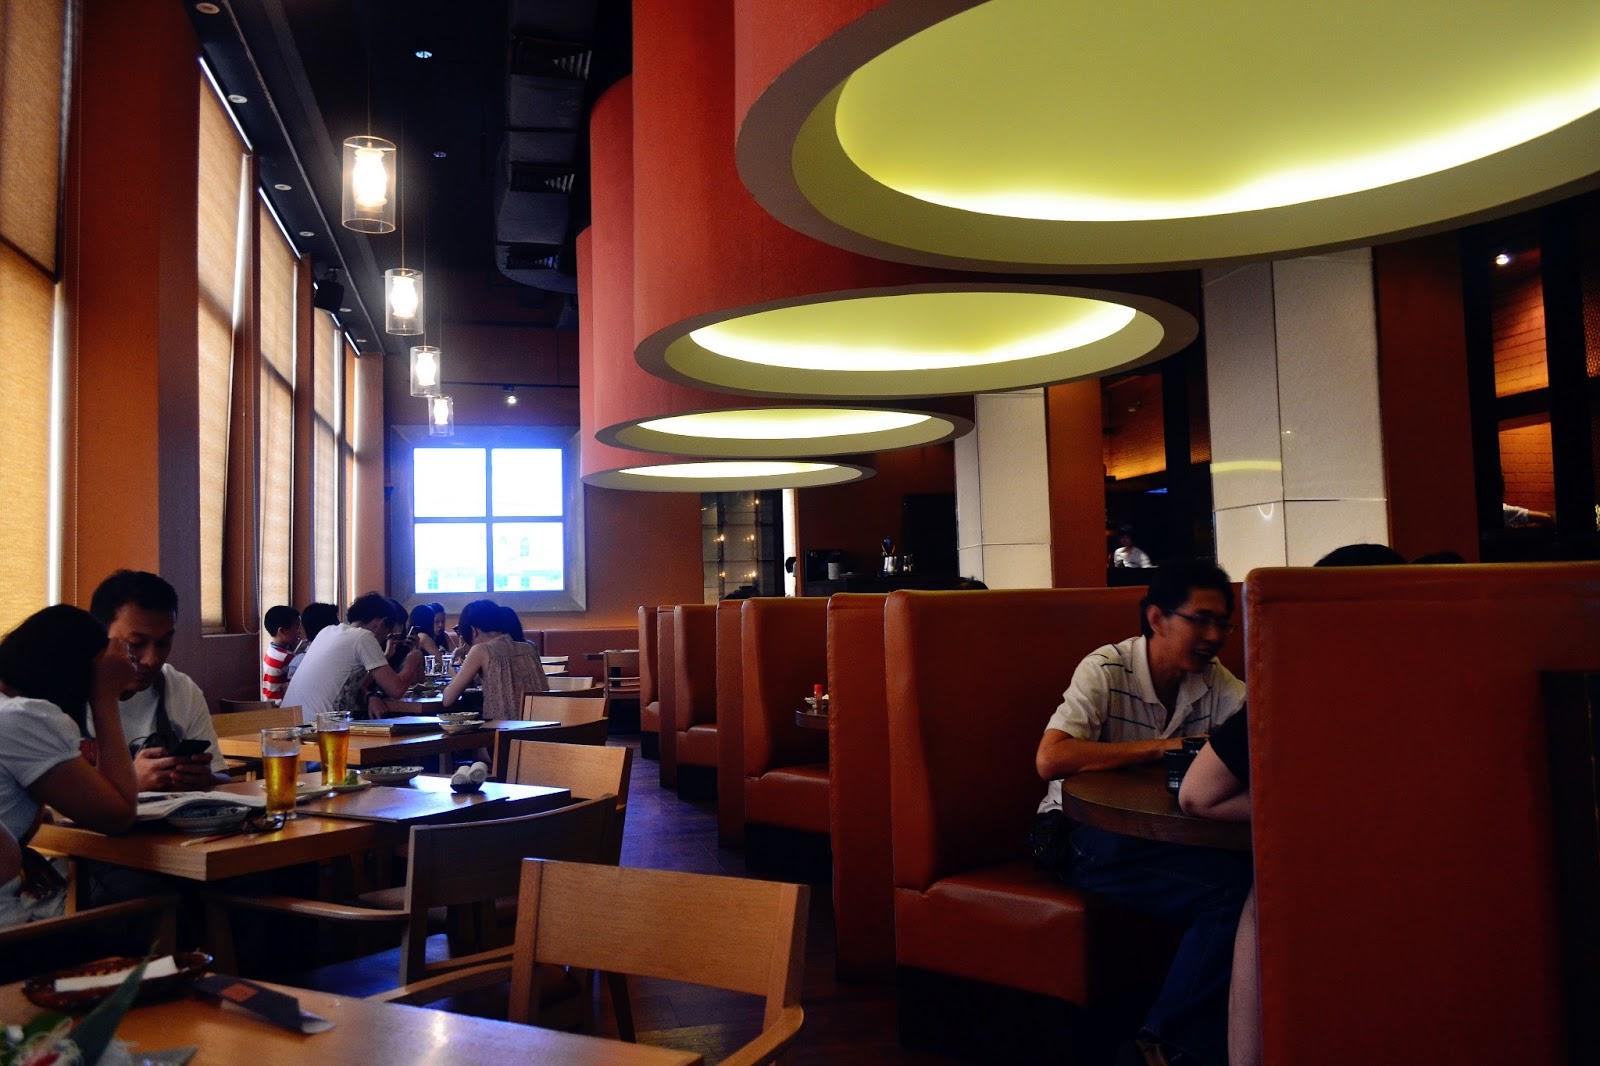 Jz world zen japanese restaurant sunway pyramid